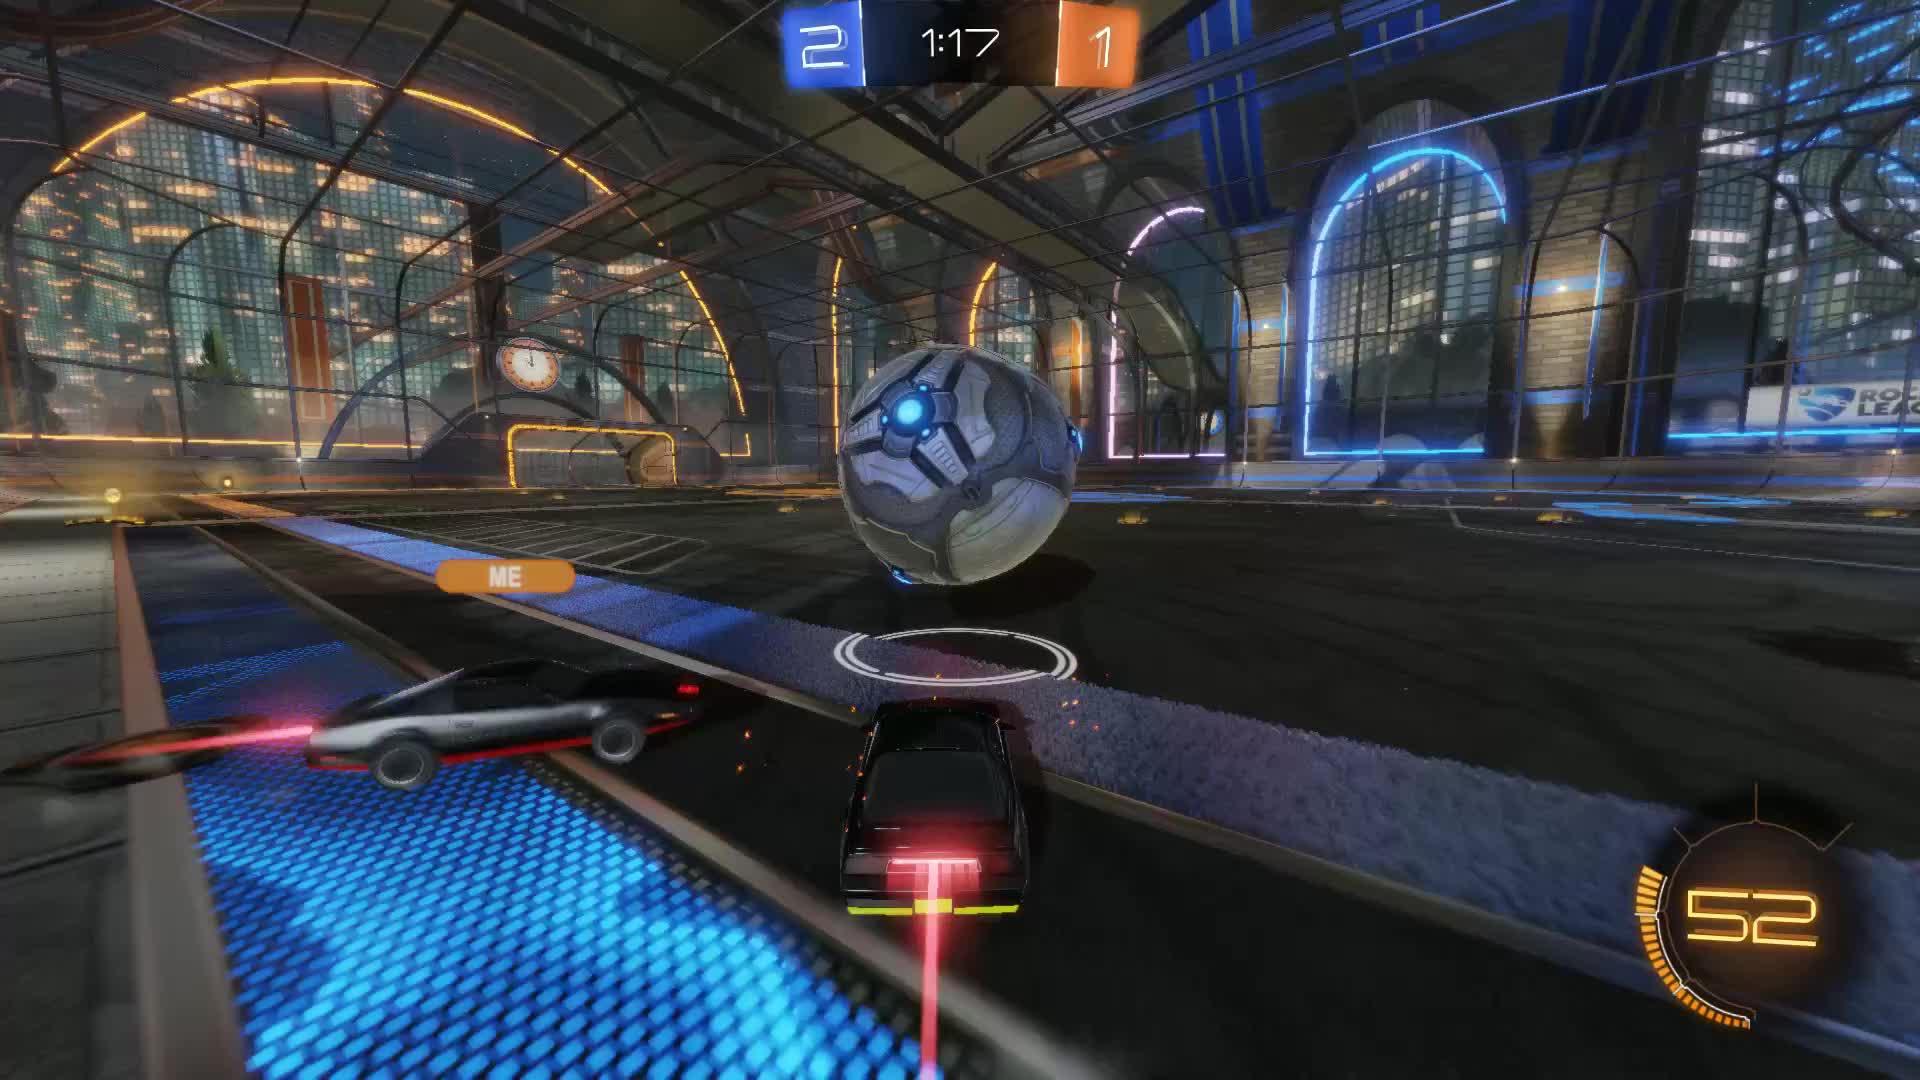 Gif Your Game, GifYourGame, Goal, Rocket League, RocketLeague, earray, Goal 4: earray GIFs